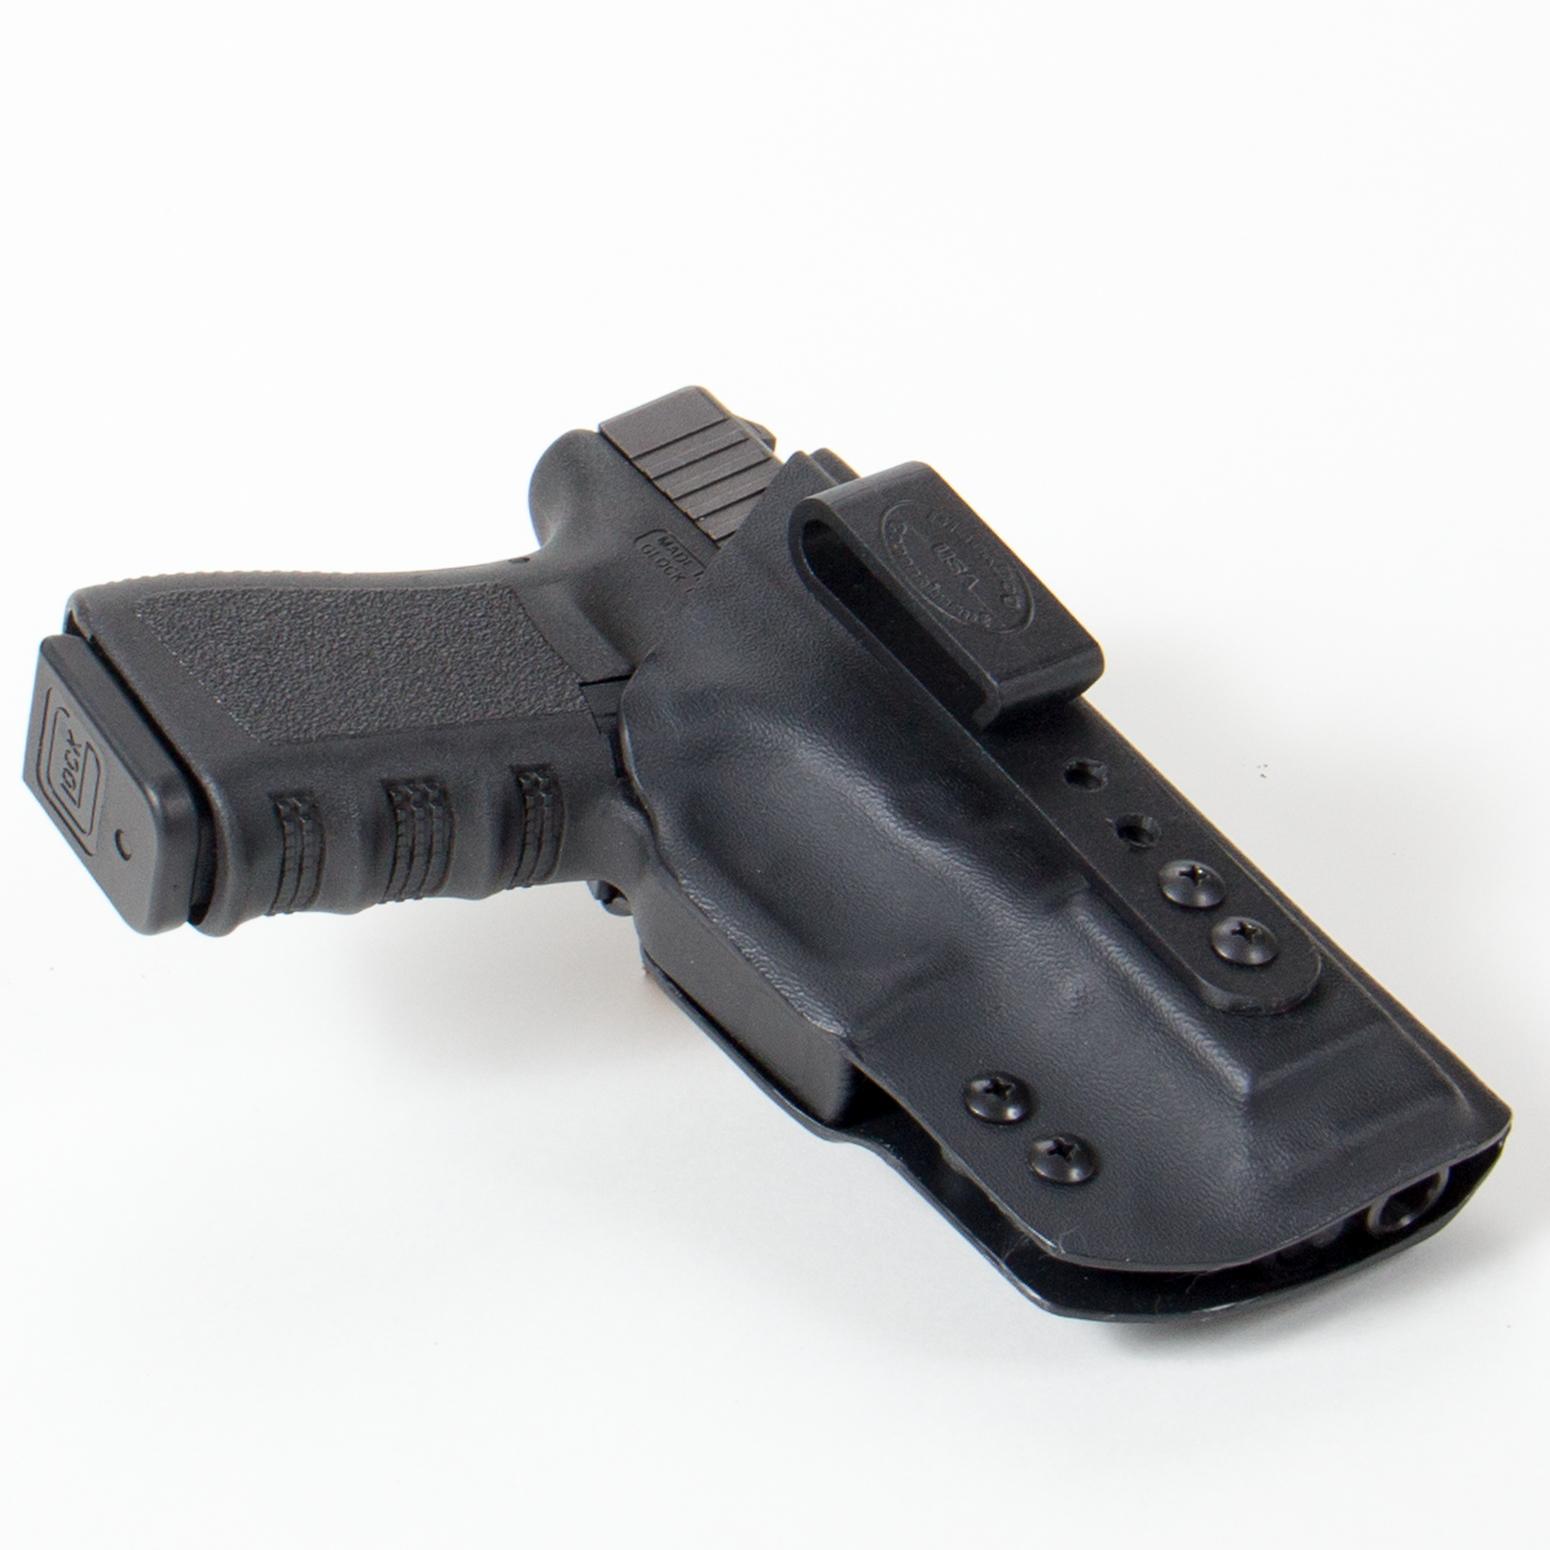 LawDog IWB Deep Concealment Holsters - BlackDog Concealment